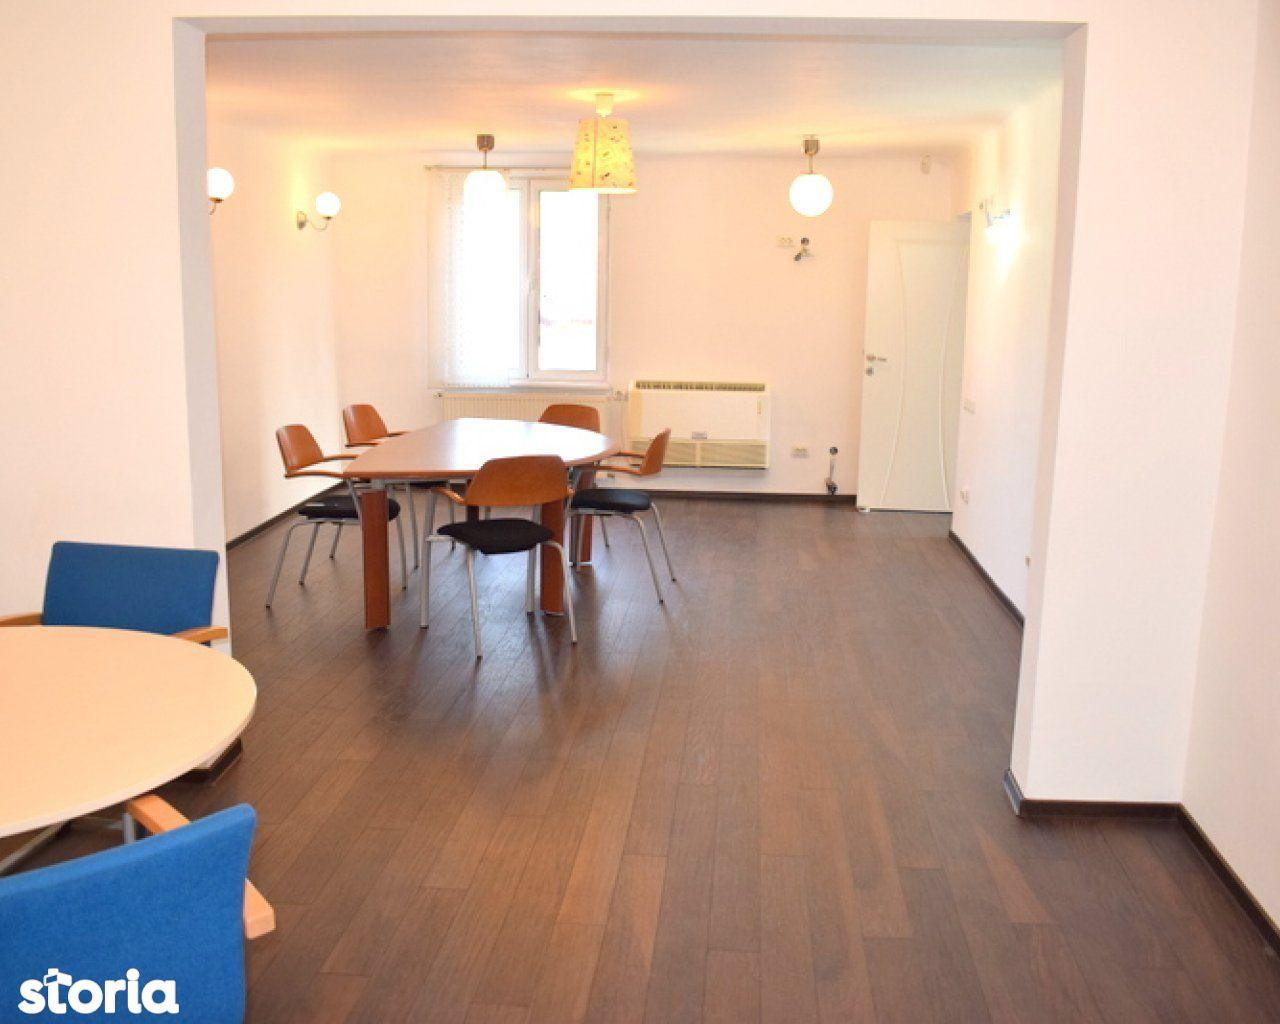 Apartament de vanzare, București (judet), Bulevardul Prof Dr. Gheorghe Marinescu - Foto 1